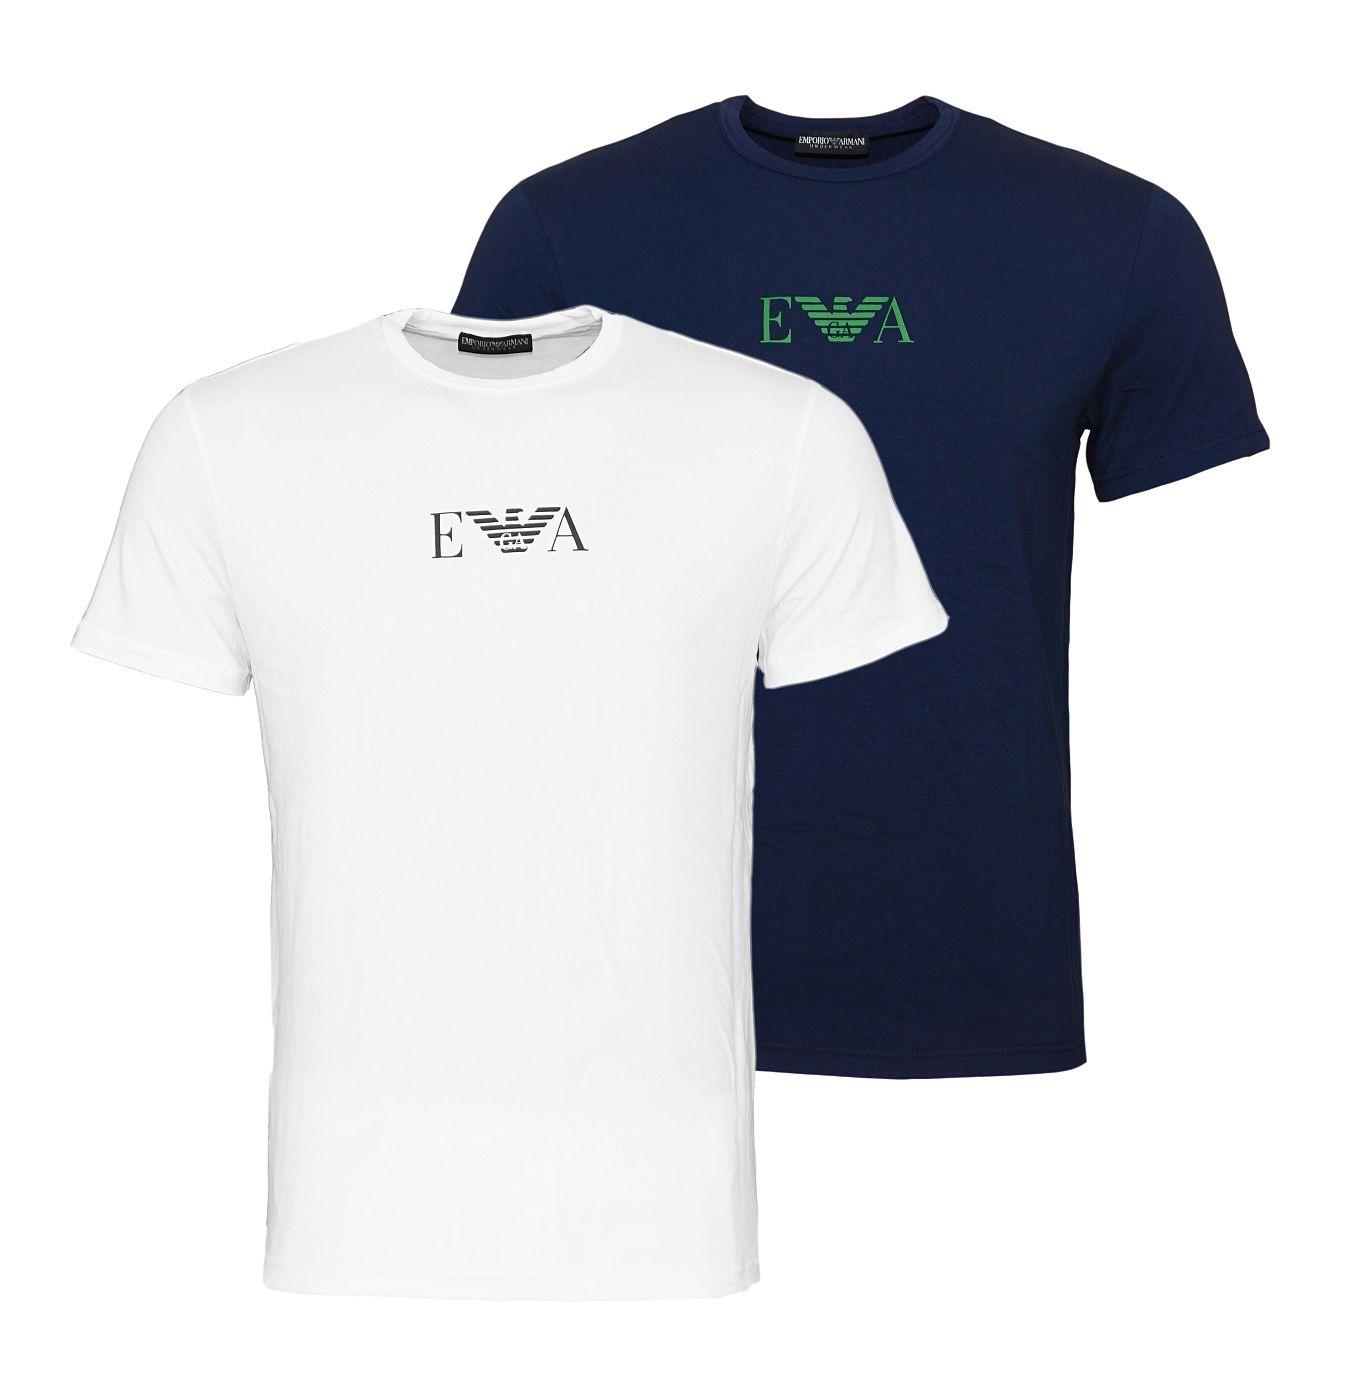 Emporio Armani 2er Pack T-Shirts Rundhals 111267 8A715 17135 MARINE/BIANCO SH18-EAT1